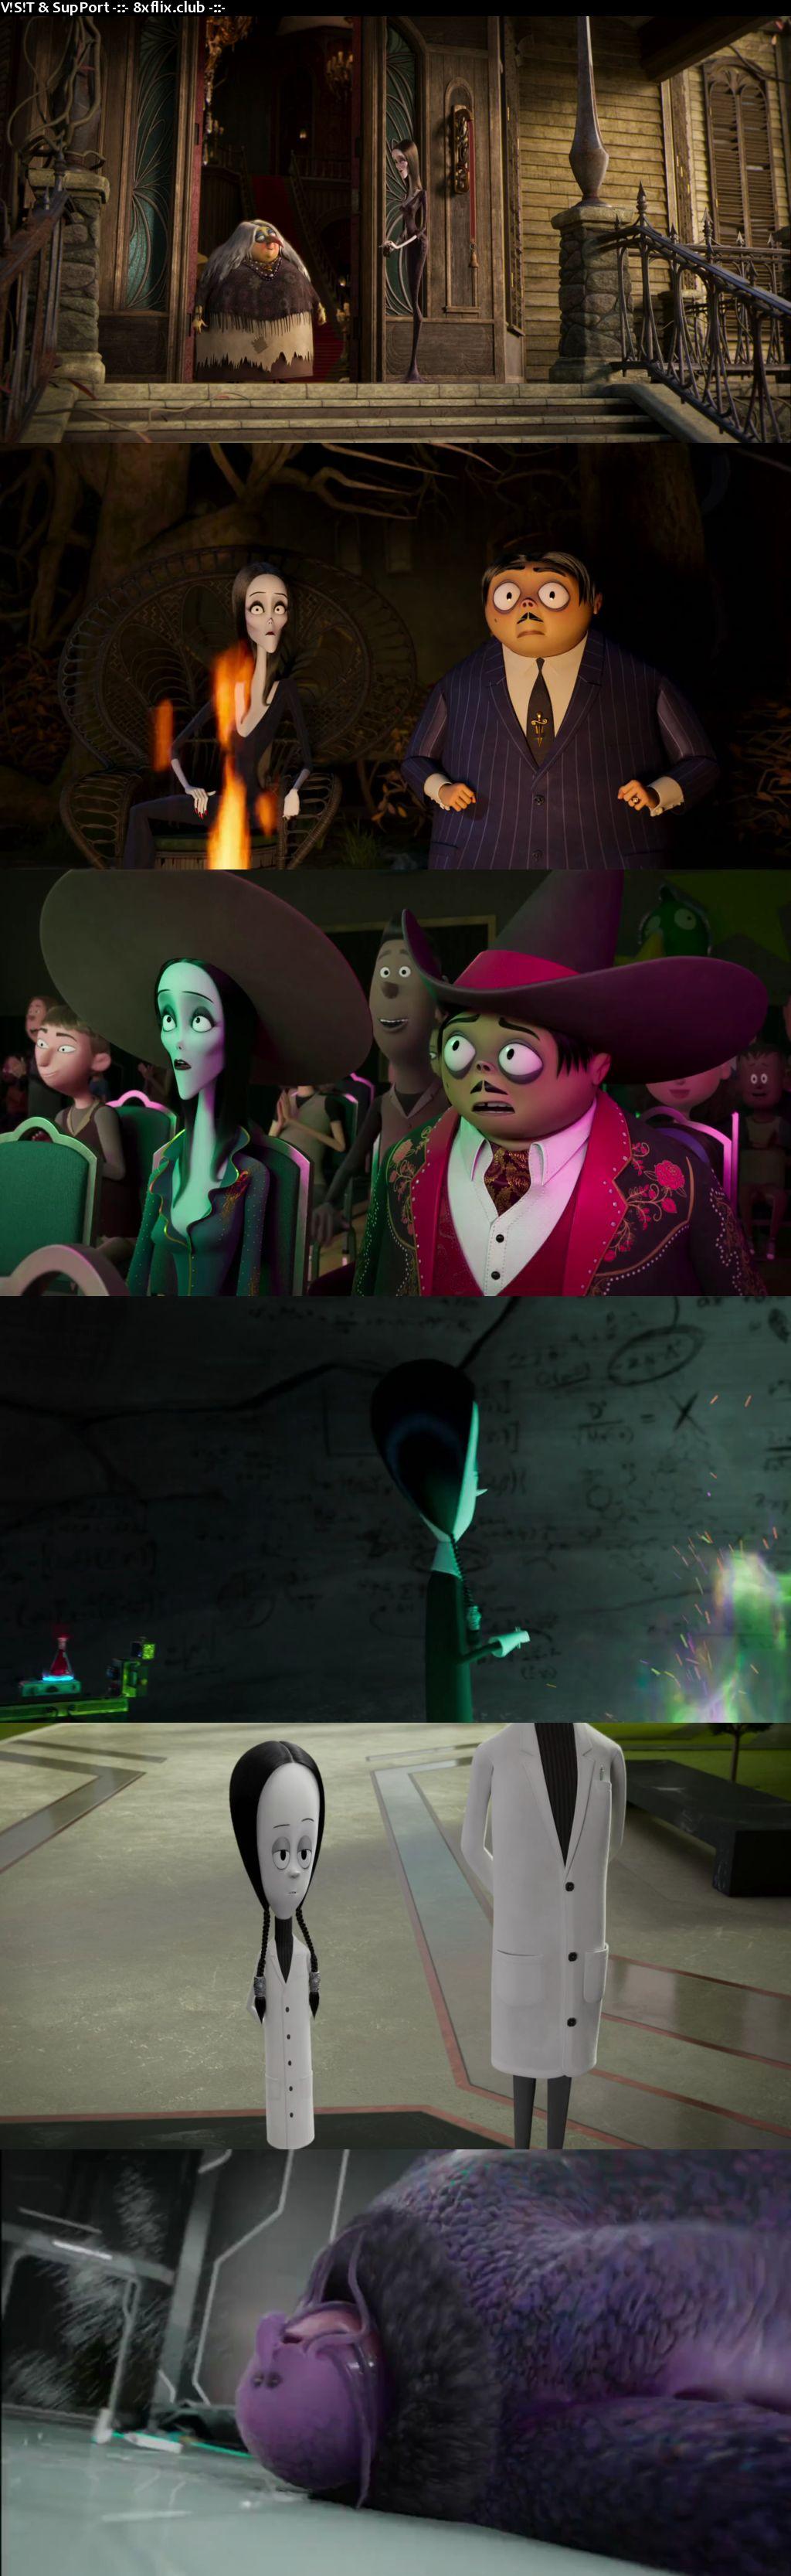 The Addams Family 2 2021 English 720p 480p Web-DL HD